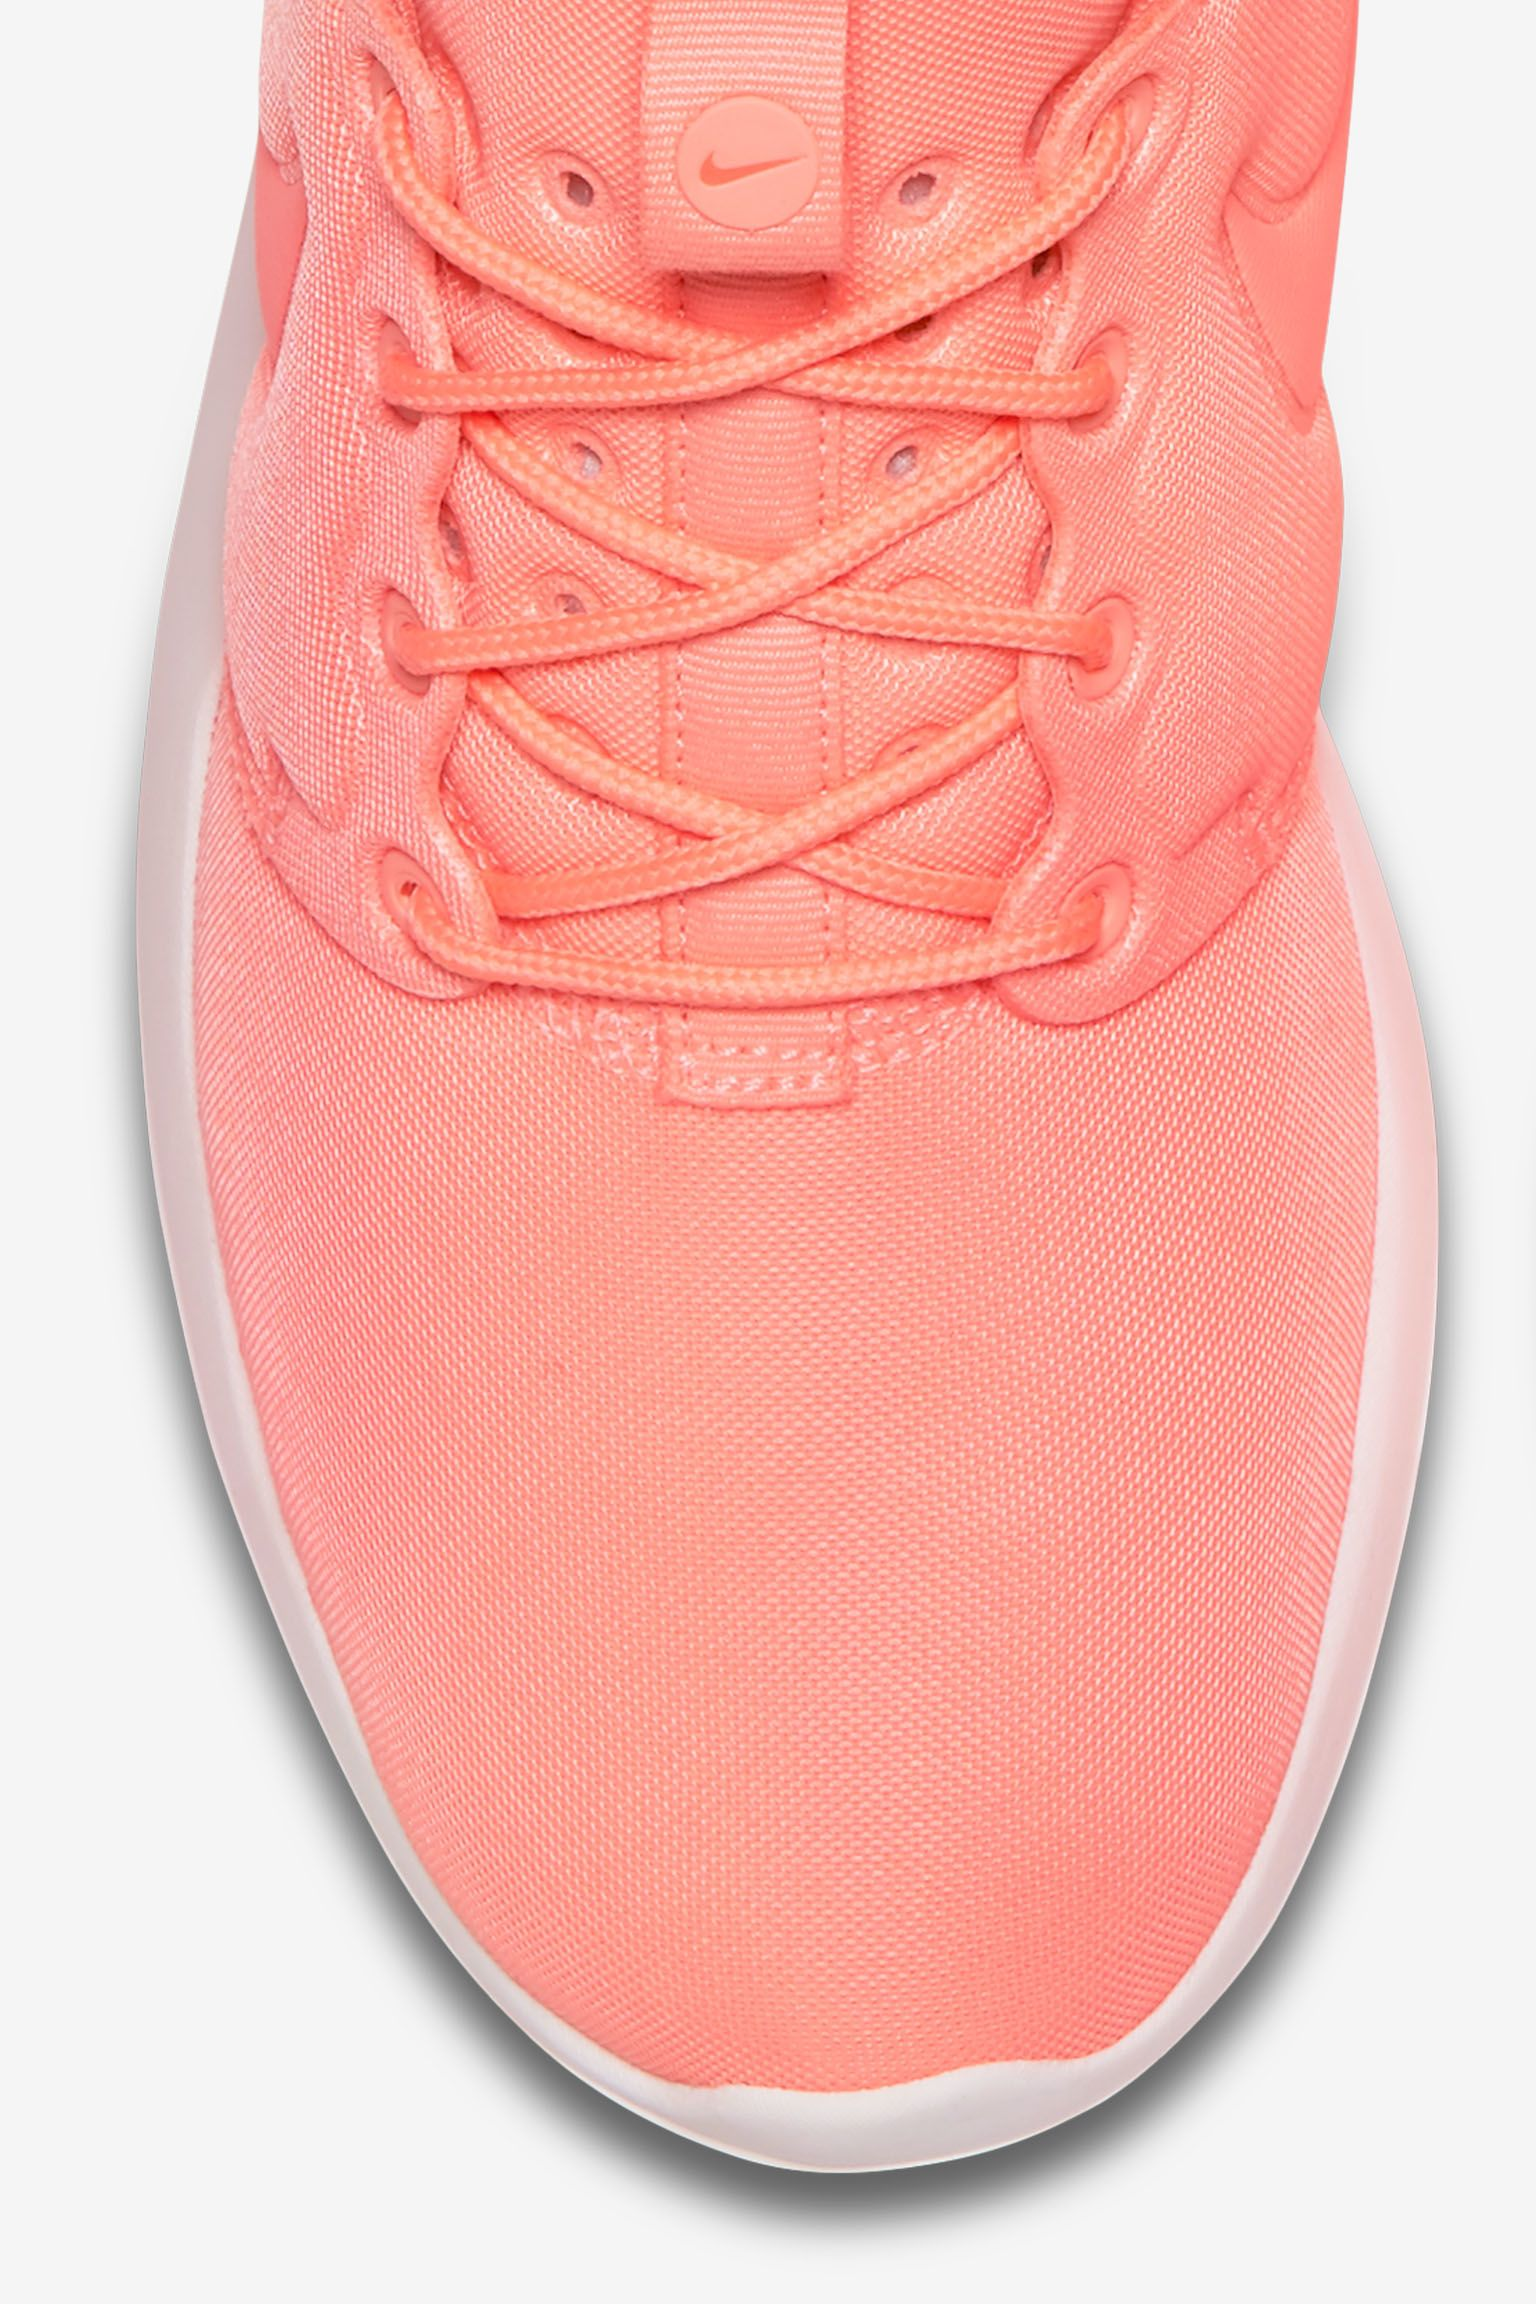 Women's Nike Roshe 2 'Atomic Pink'